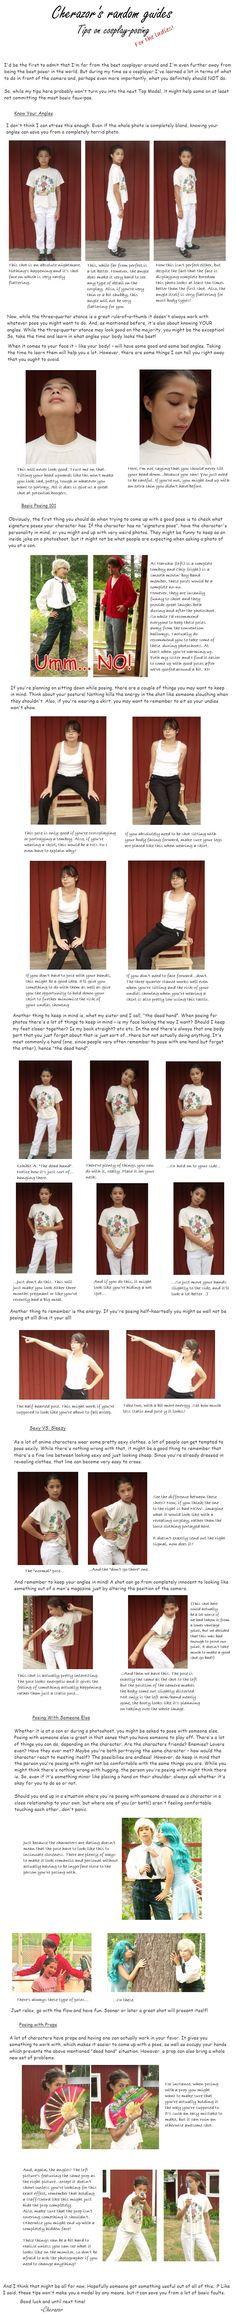 Guide: Posing in Cosplay by *Cherazor on deviantART